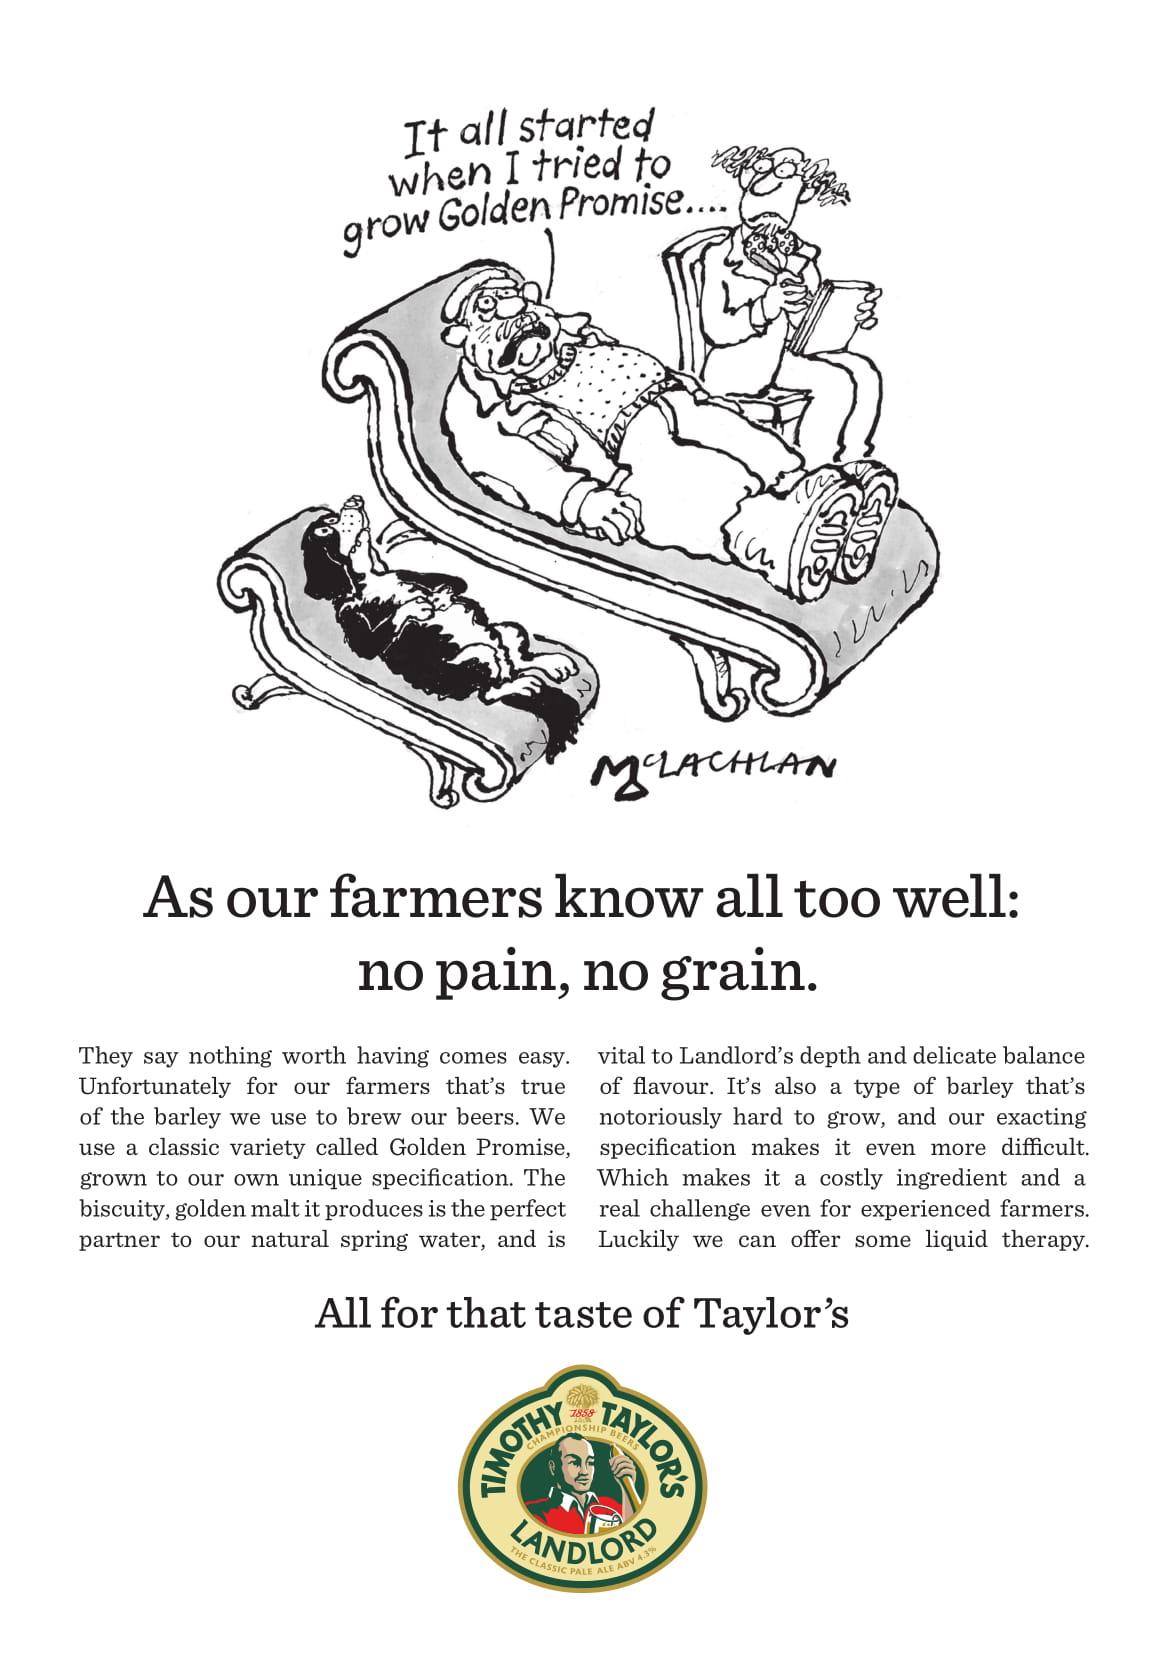 timothytaylor-s-afttot-a5-001-no-pain-no-grain-1.jpg